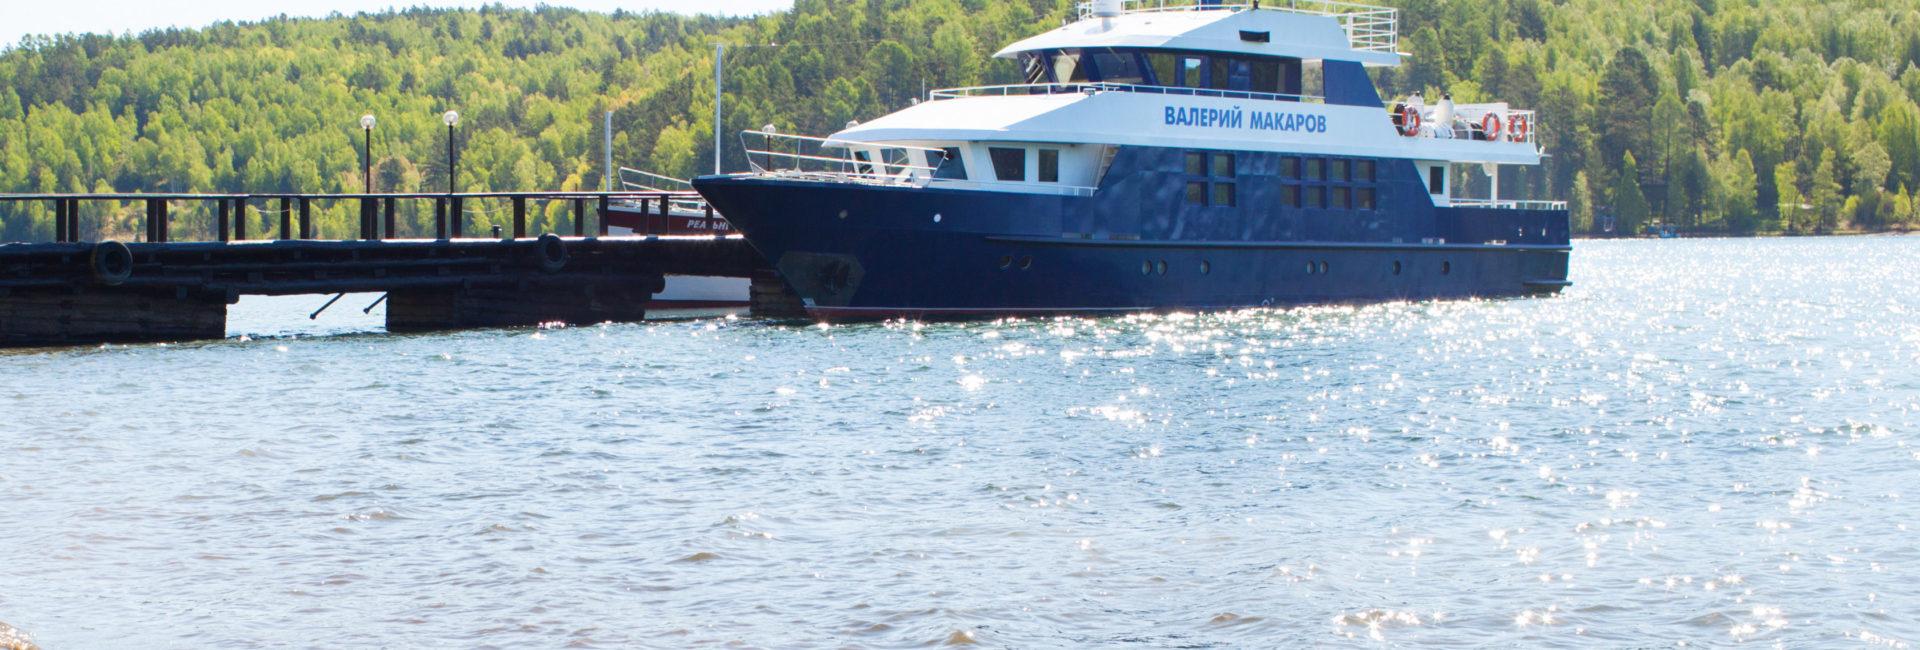 Cruise ships on Baikal